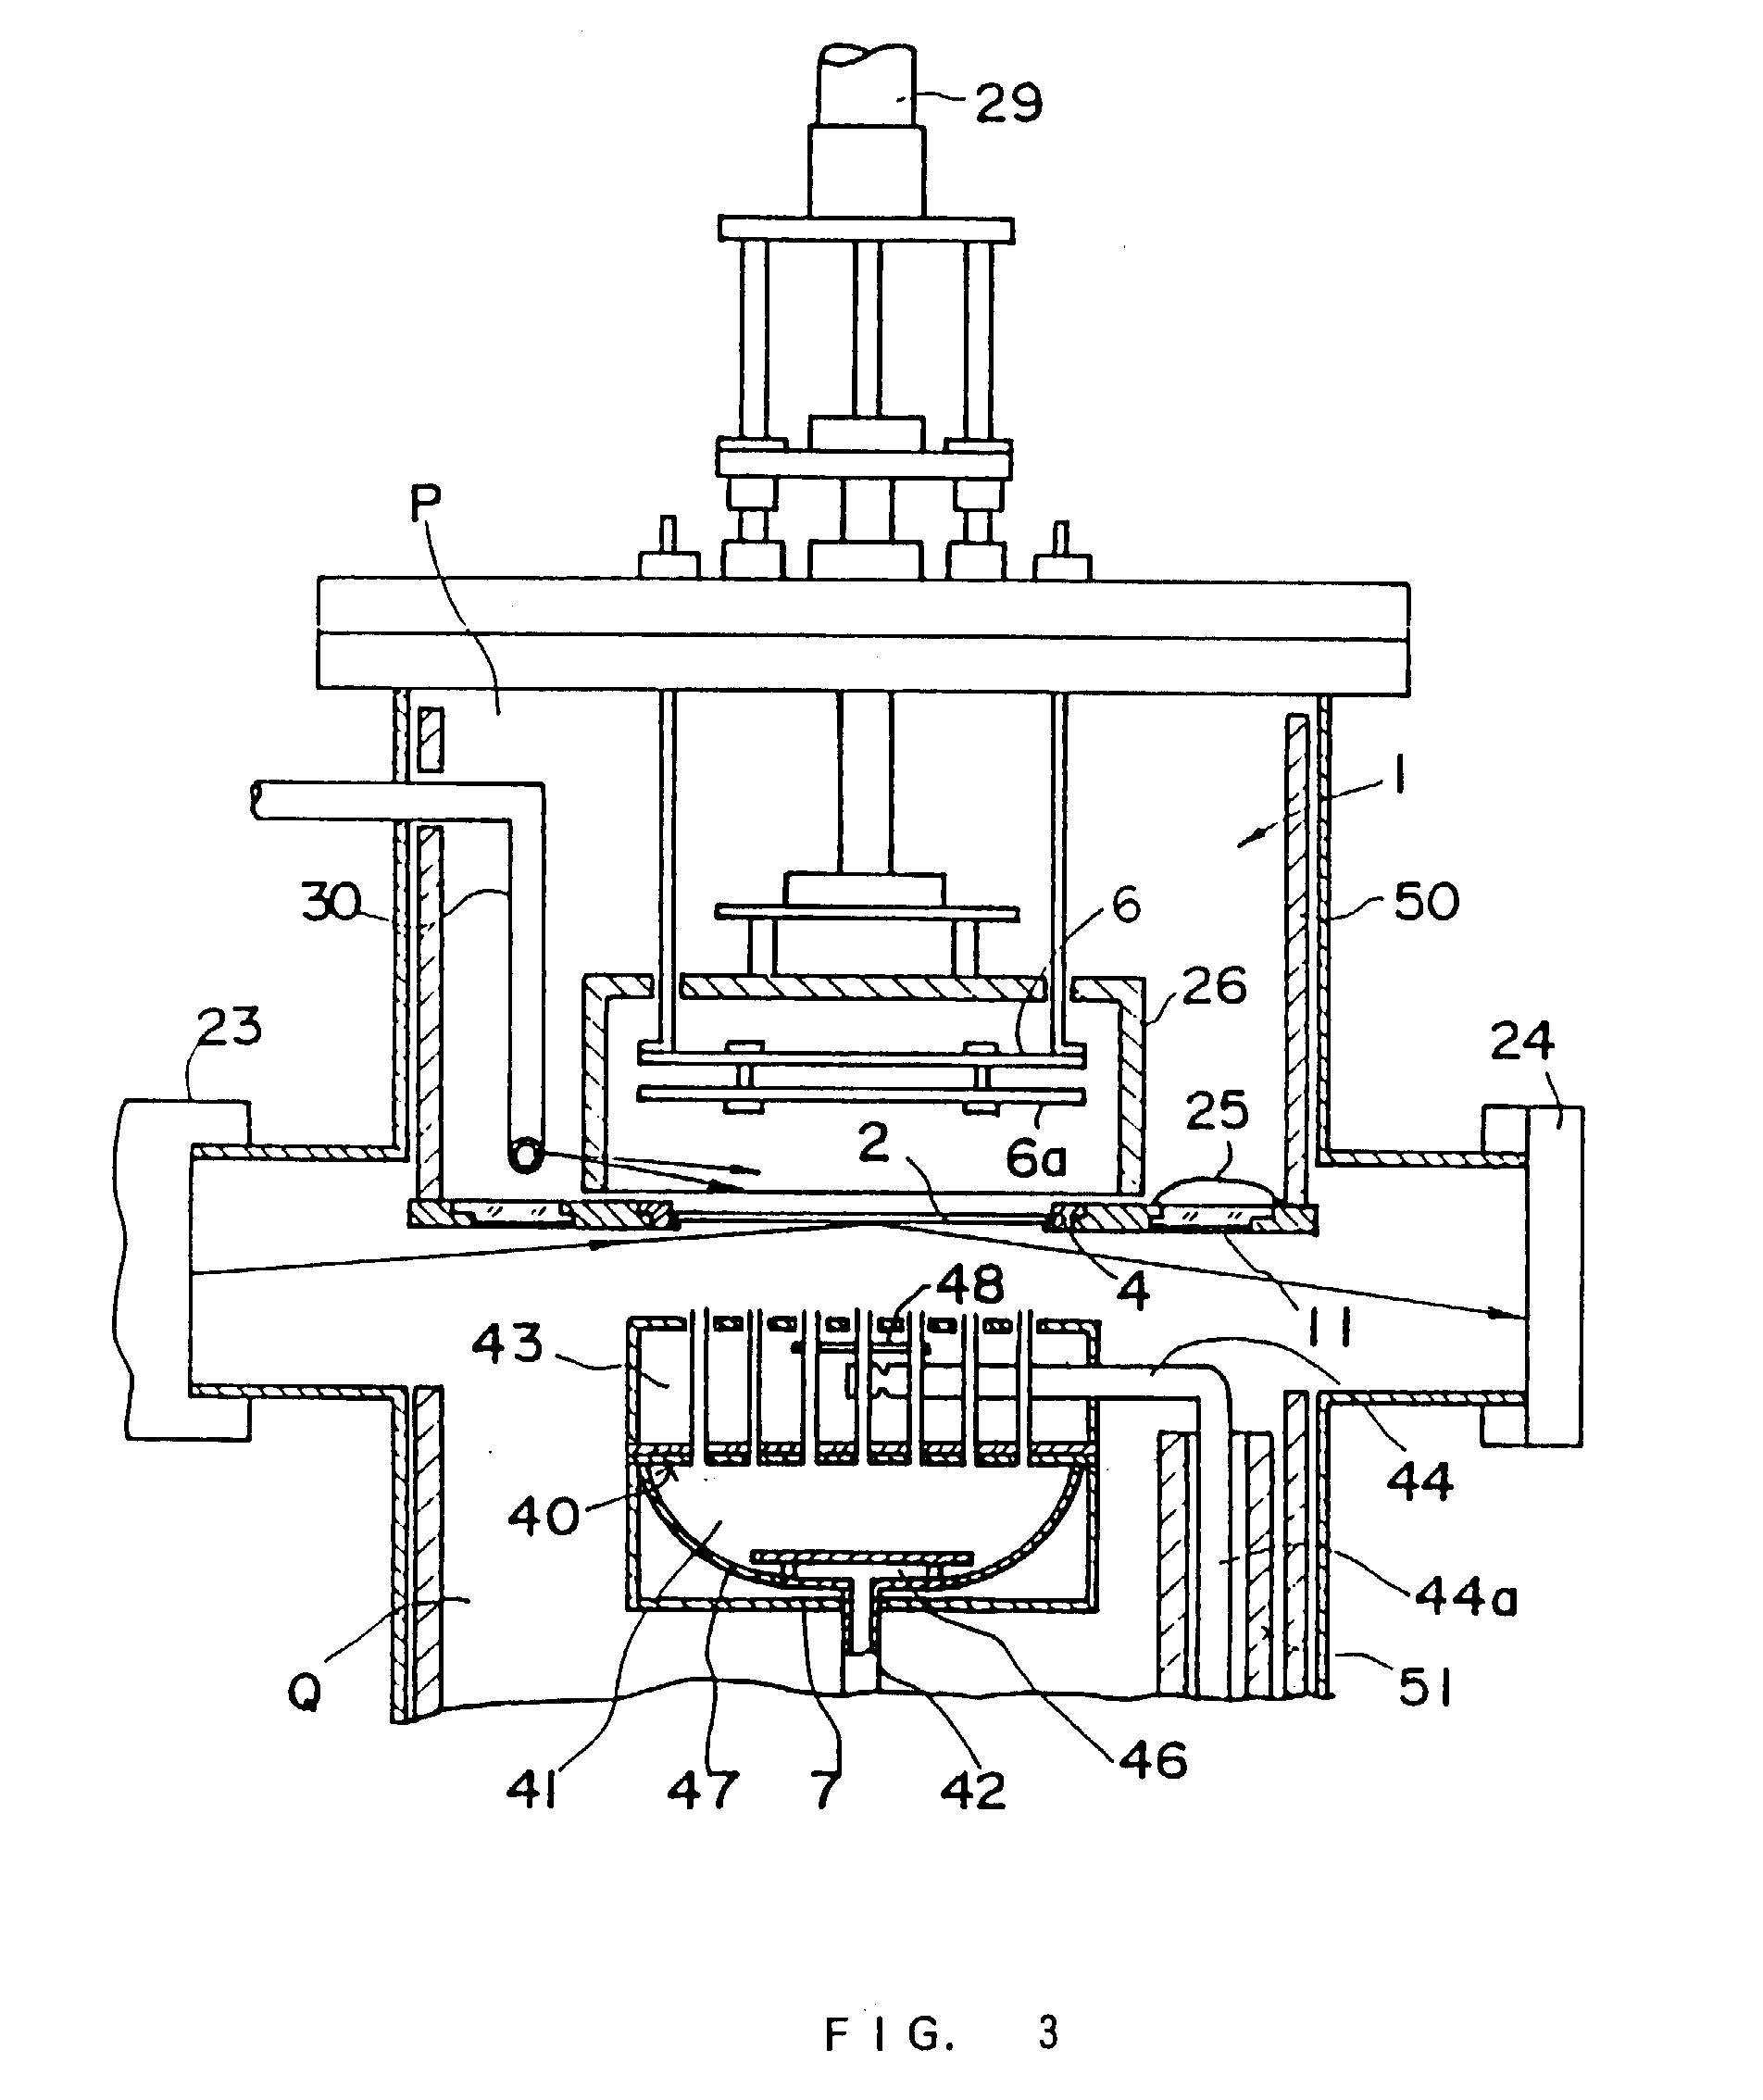 专利ep0573707b1 - appareillage